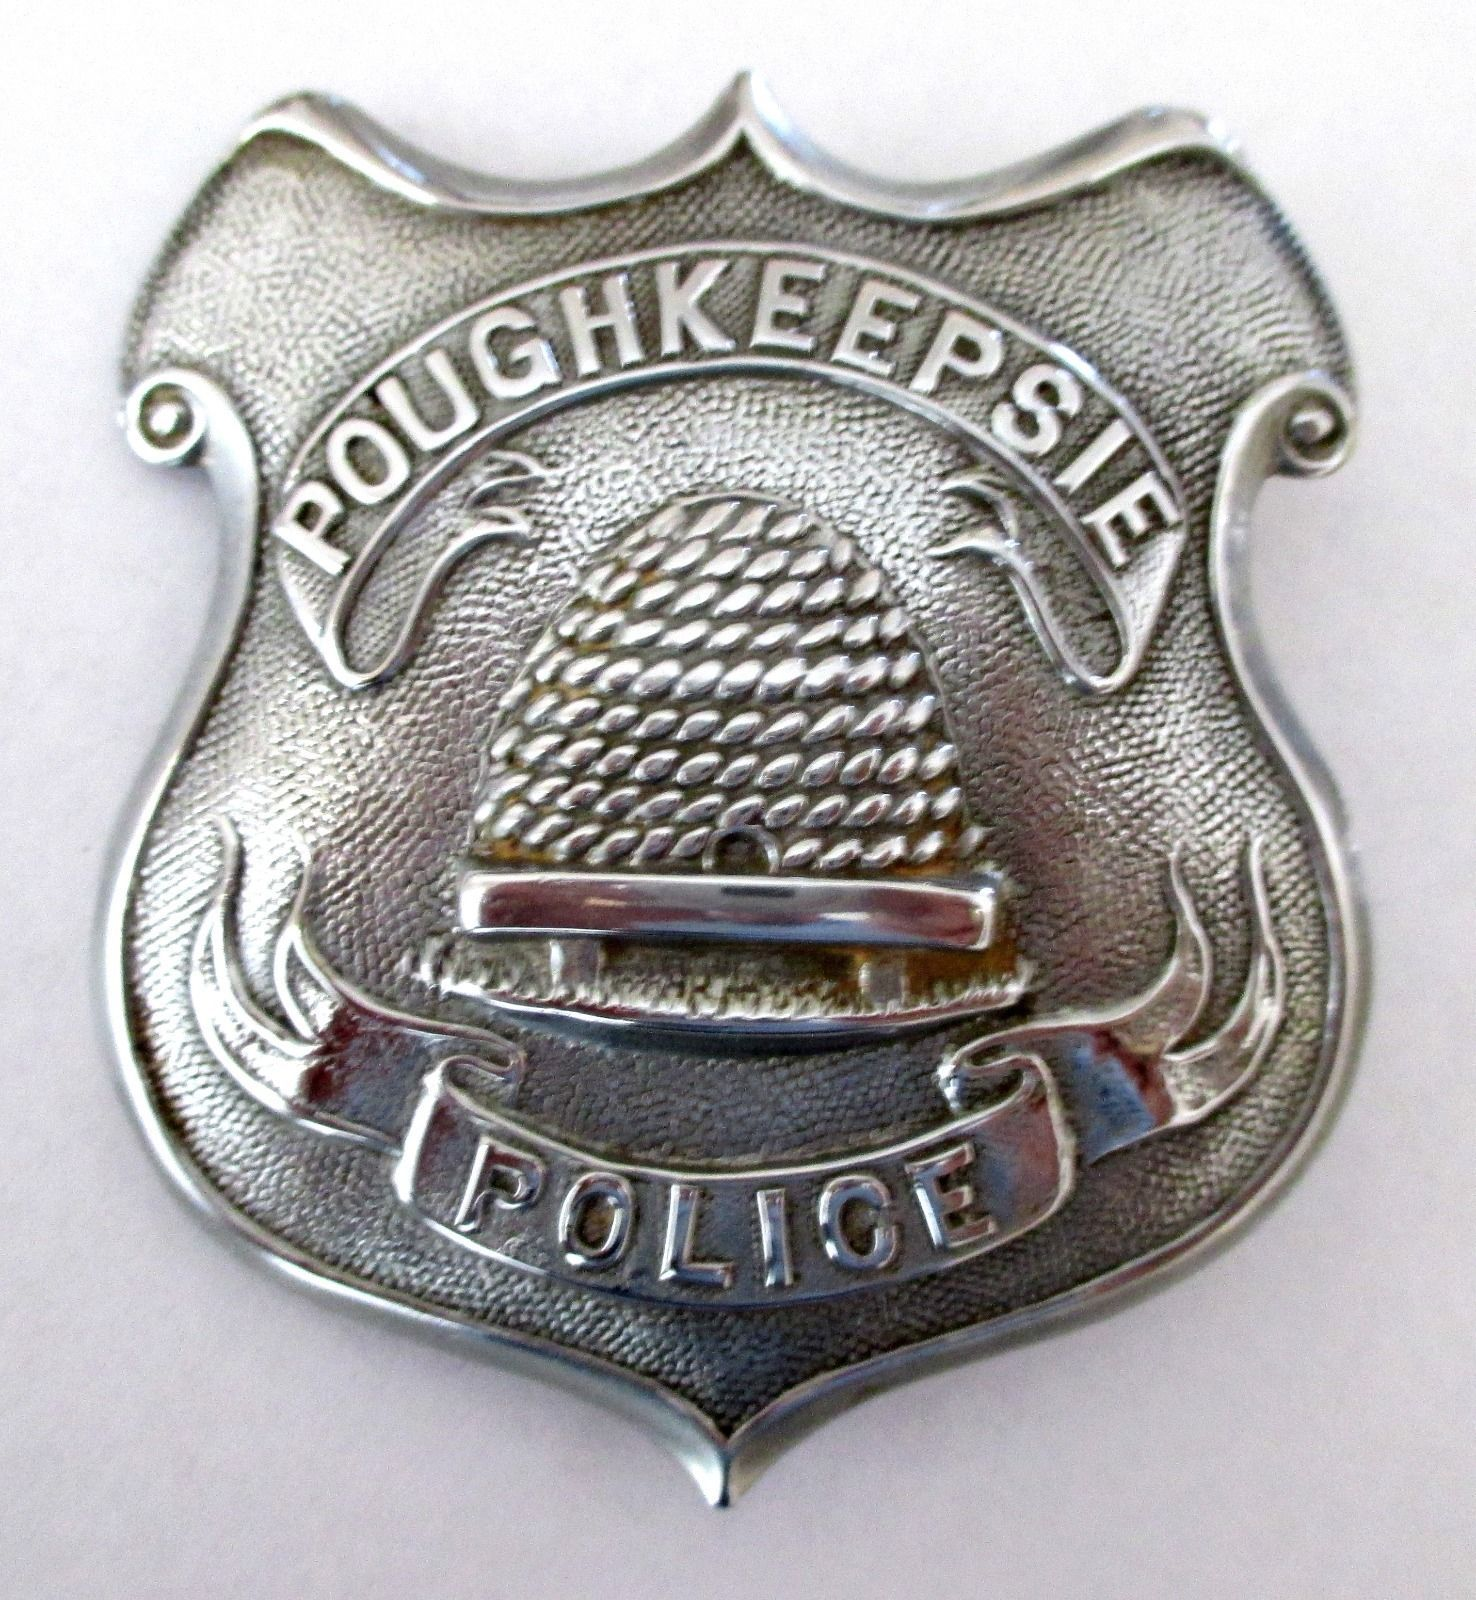 vintage obsolete police officer badge for poughkeepsie n y circa